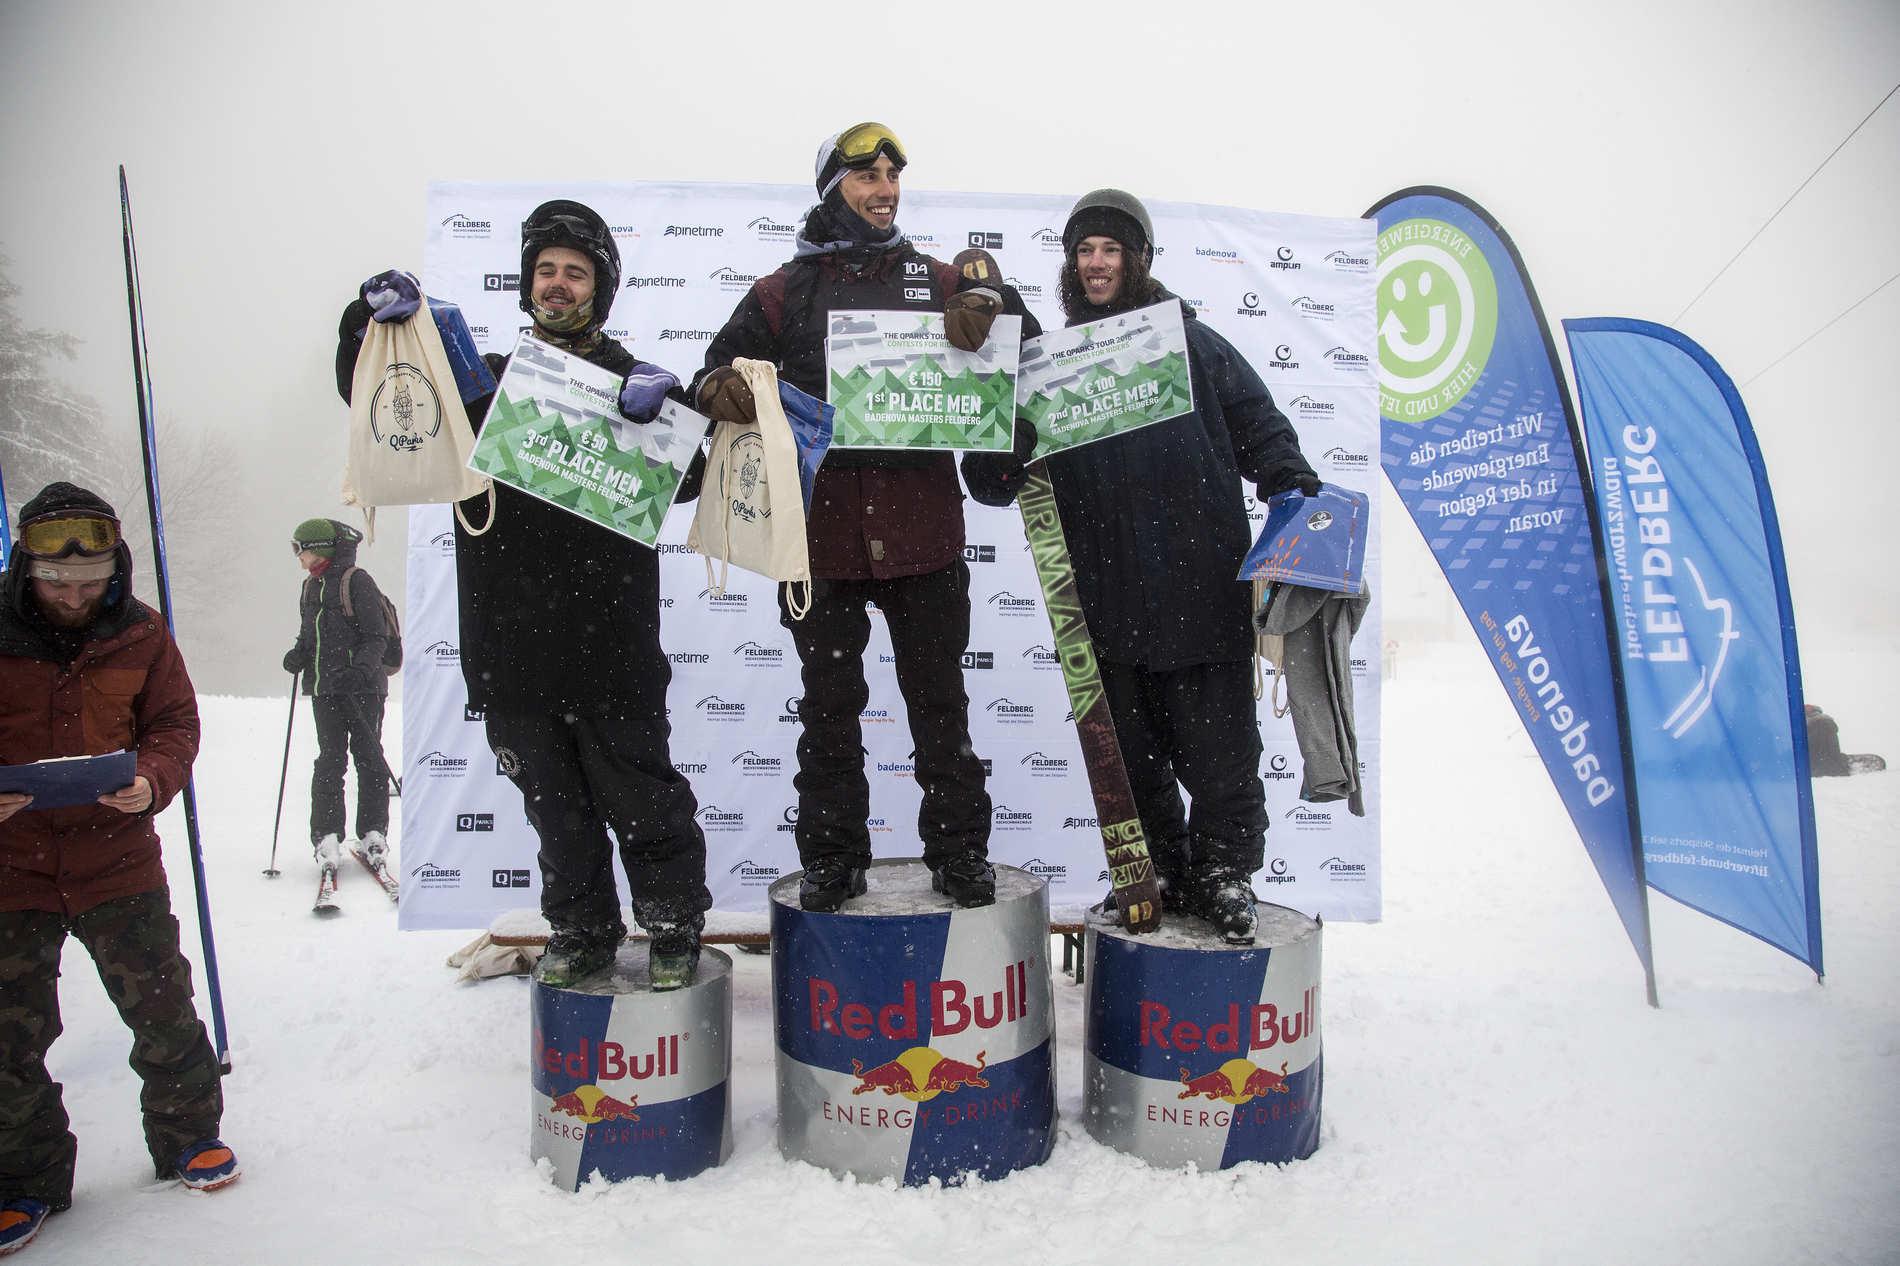 web snowpark feldberg 17 02 2018 lifestyle fs sb martin herrmann qparks 16